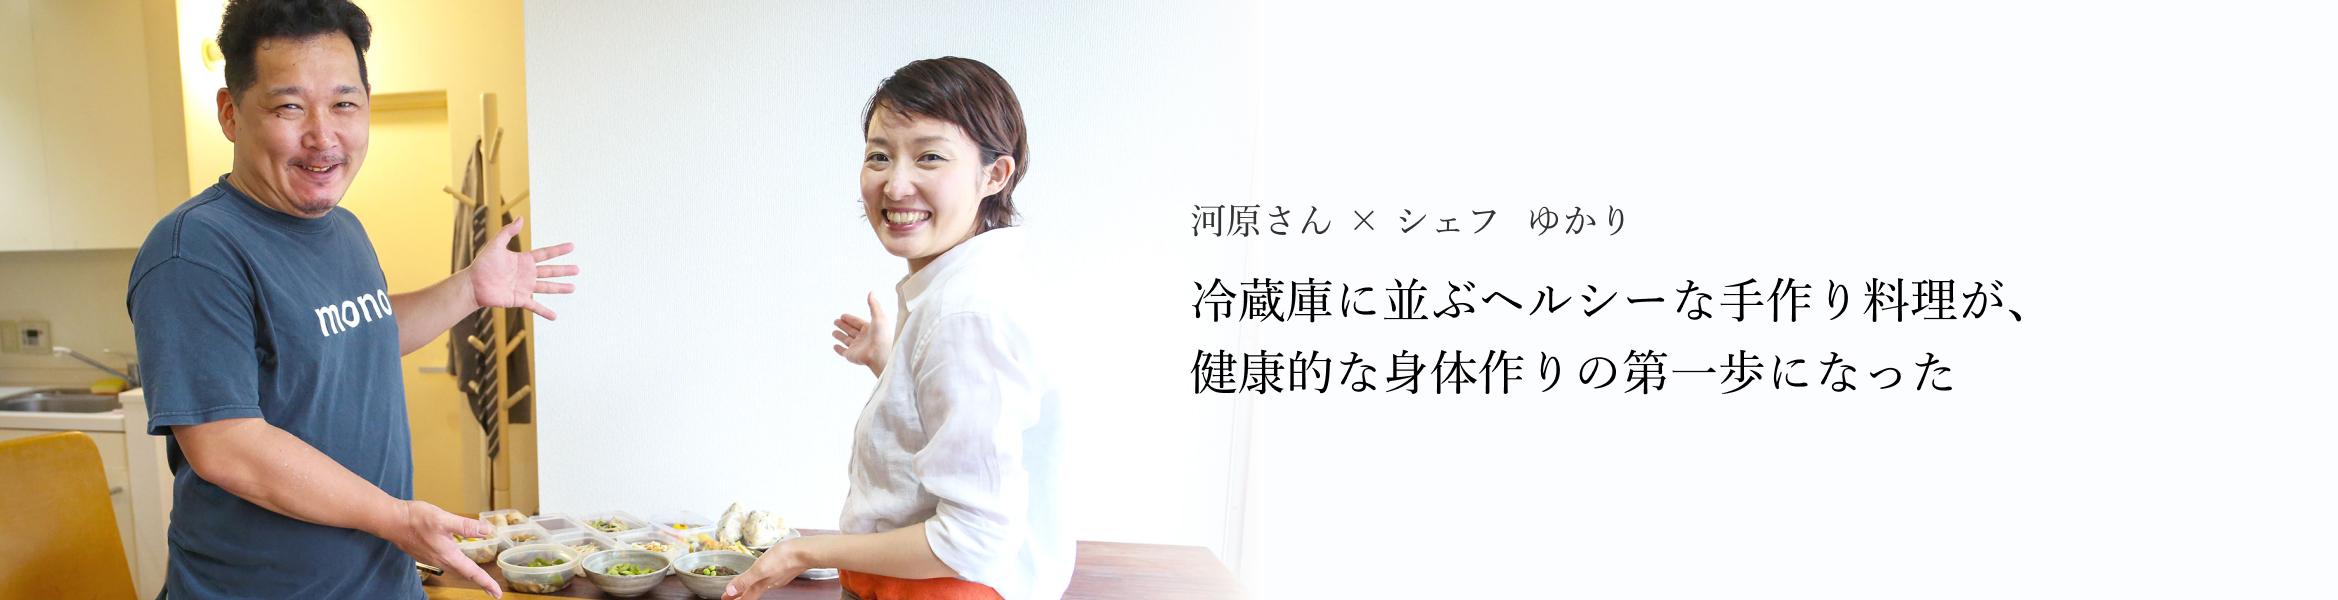 Interview banner 2 pc